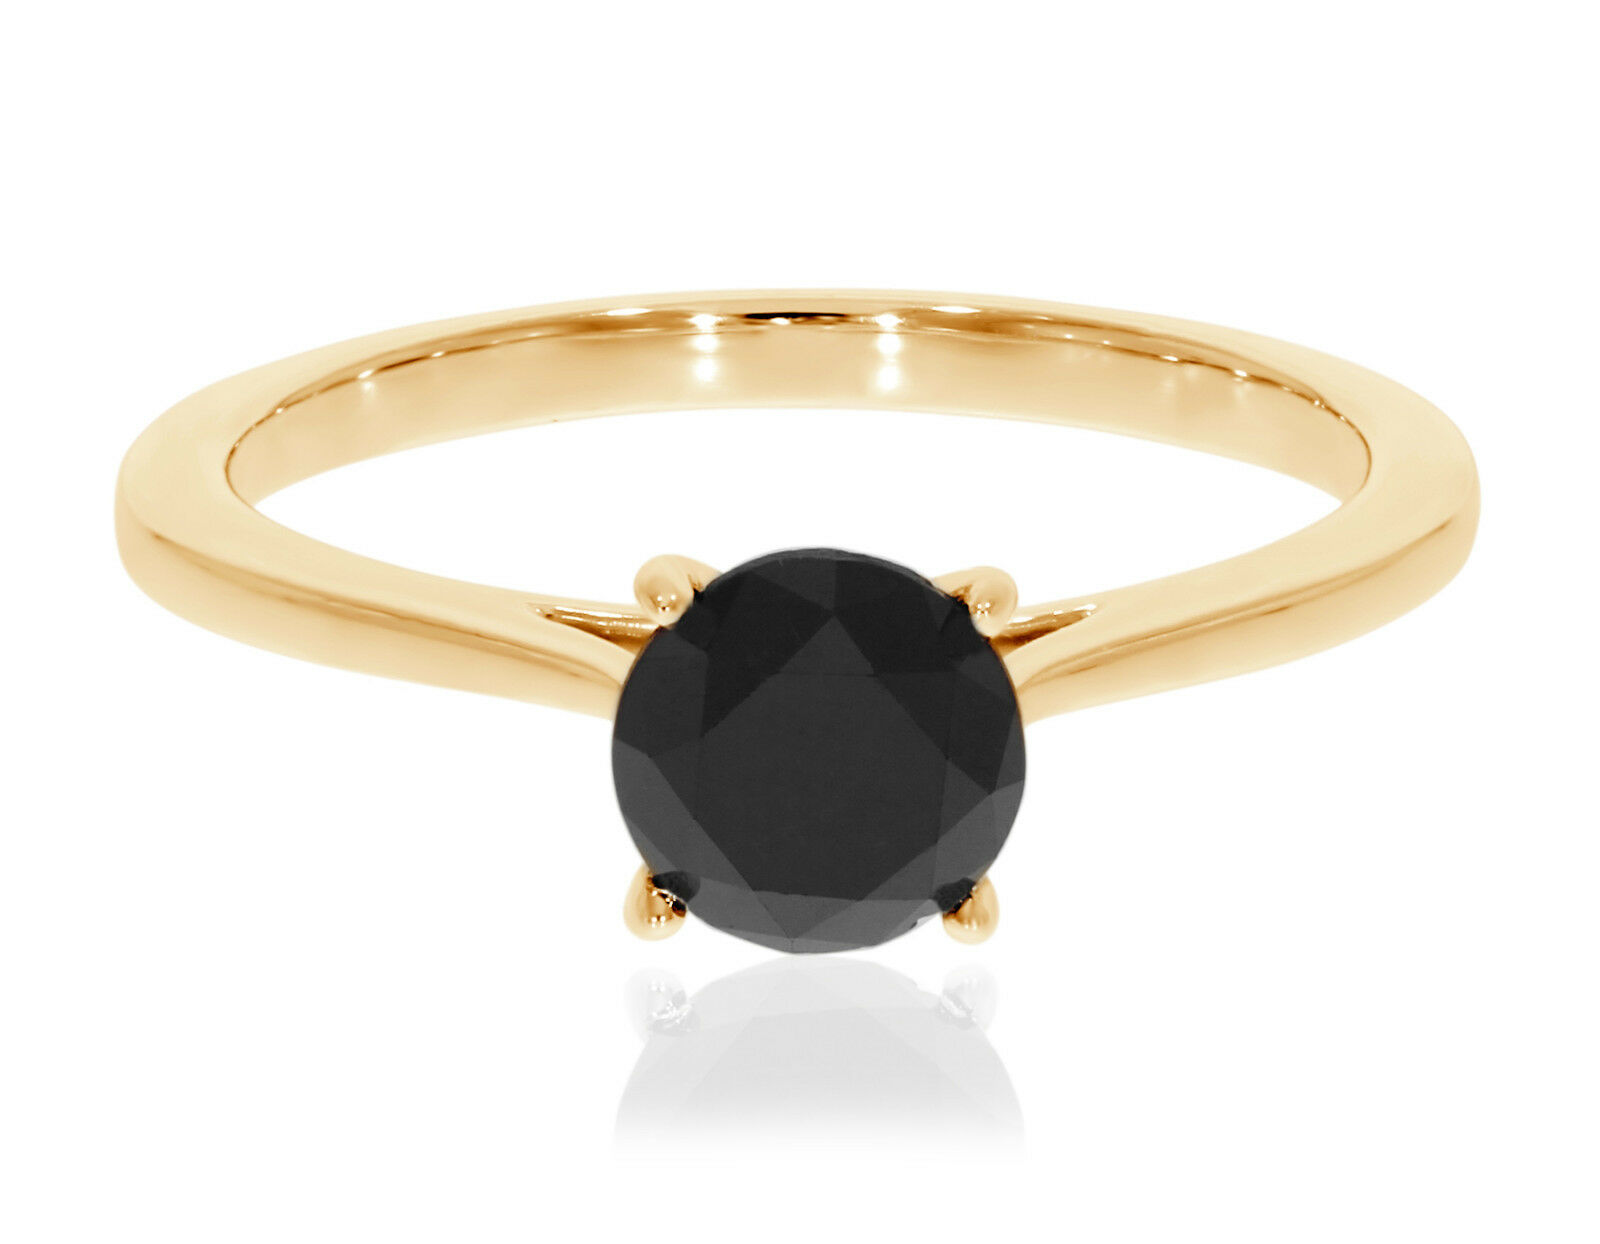 Prism Jewel 1.25 Carat Prong Set Round Black Diamond Solitai